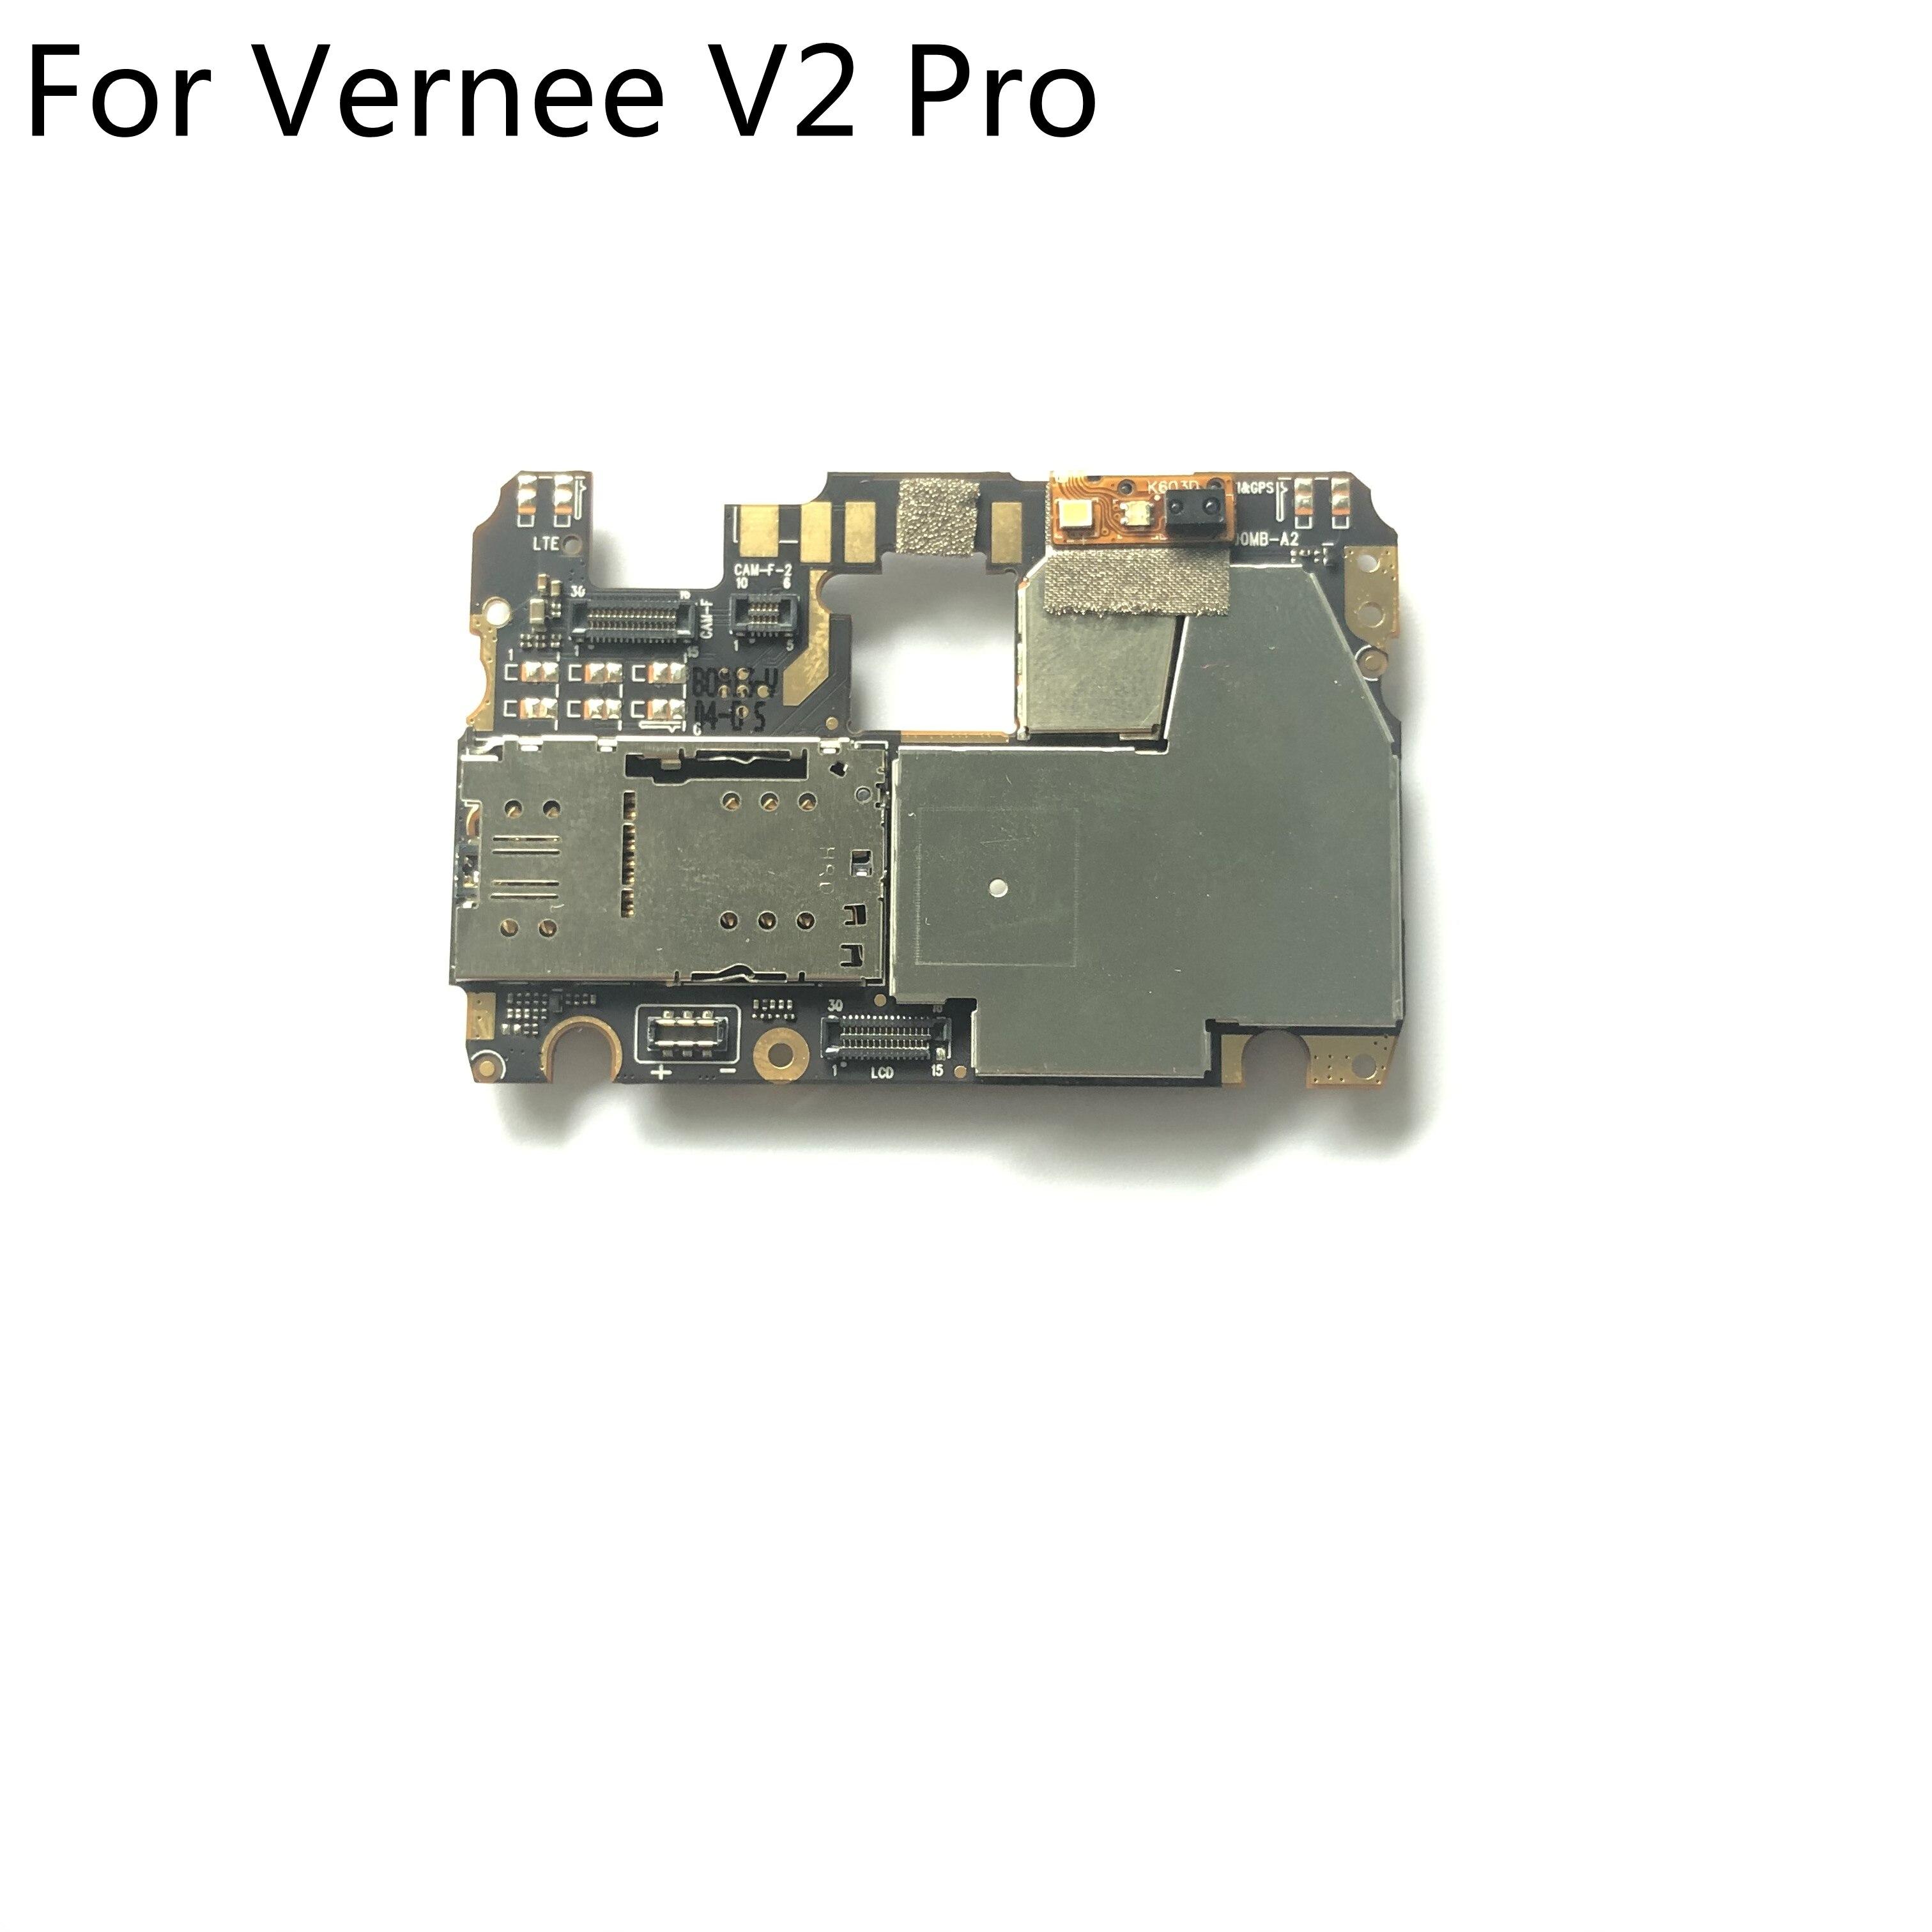 "Vernee v2 pro usado mainboard 6g ram + 64g rom placa-mãe para vernee v2 pro mt6763 octa core 5.99 ""2160x1080 smartphones"